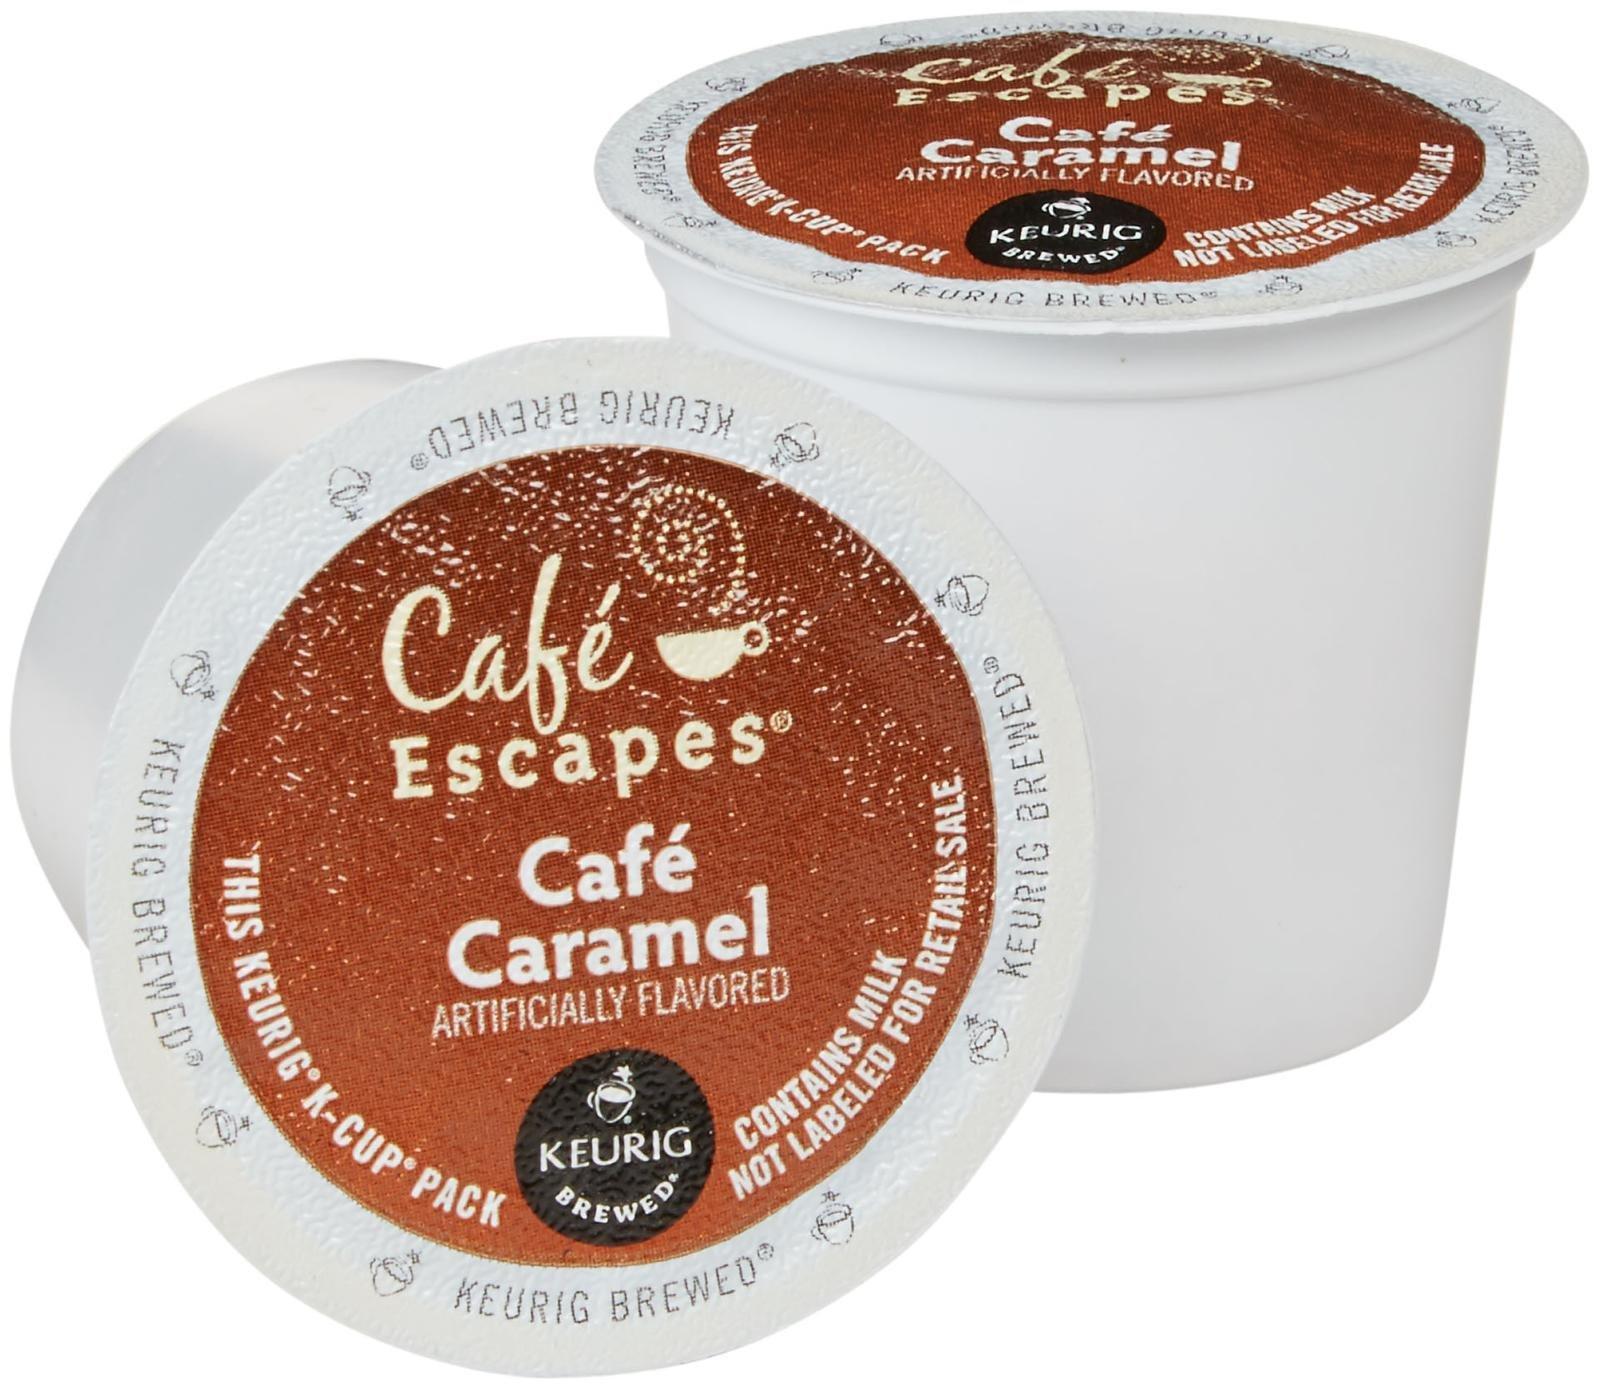 Cafe Escapes Caf Caramel